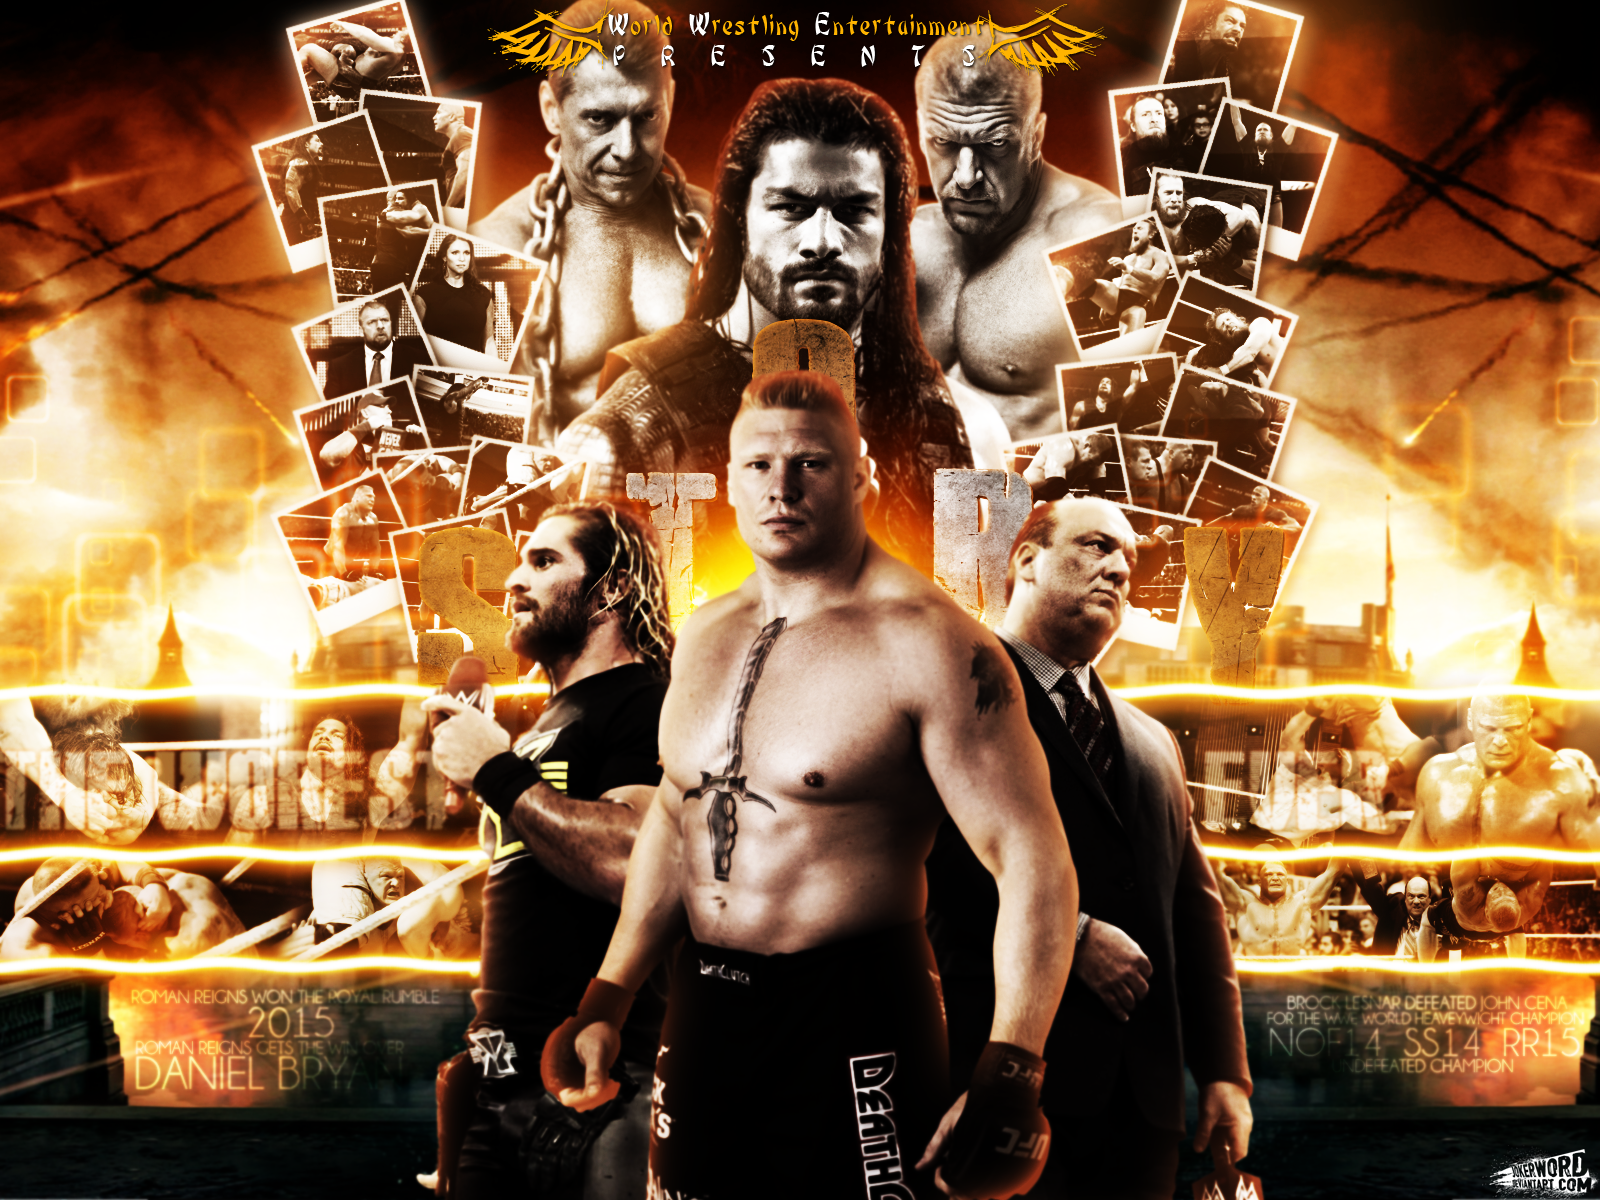 Wrestlemania 31 Brock Lesnar VS Roman Reigns By JoKeRWord